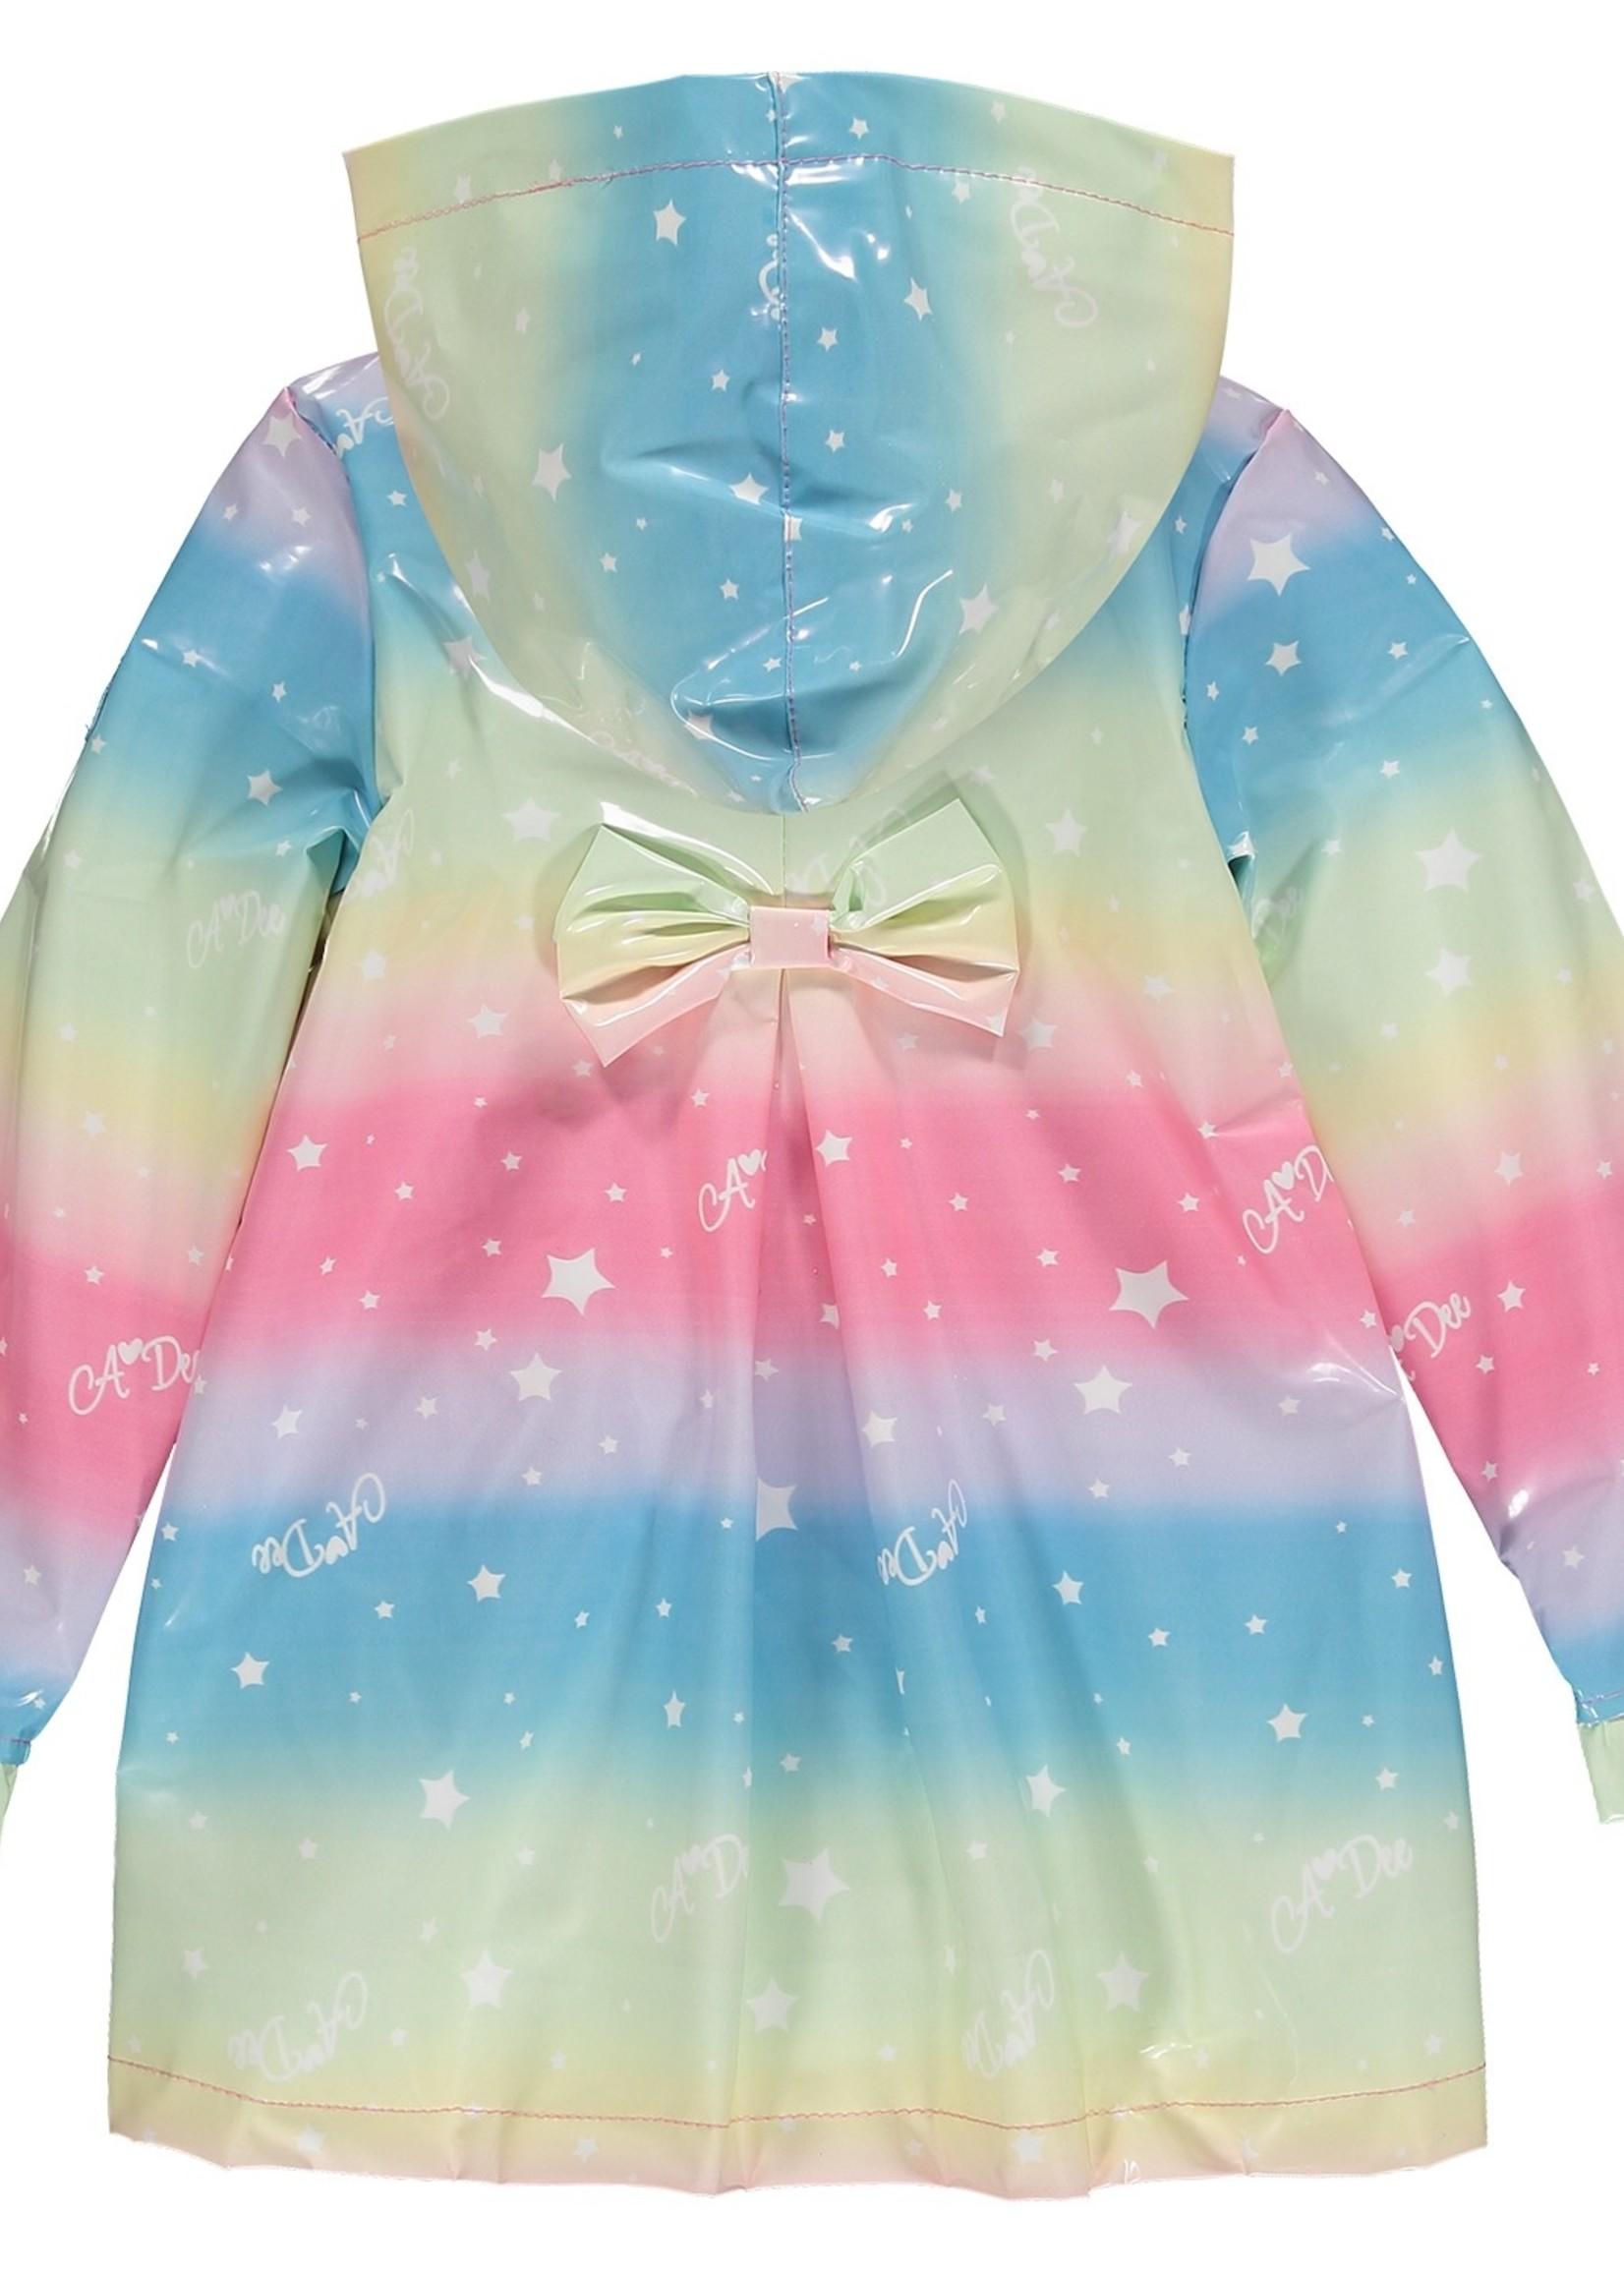 A Dee Nala rainbow print raincoat